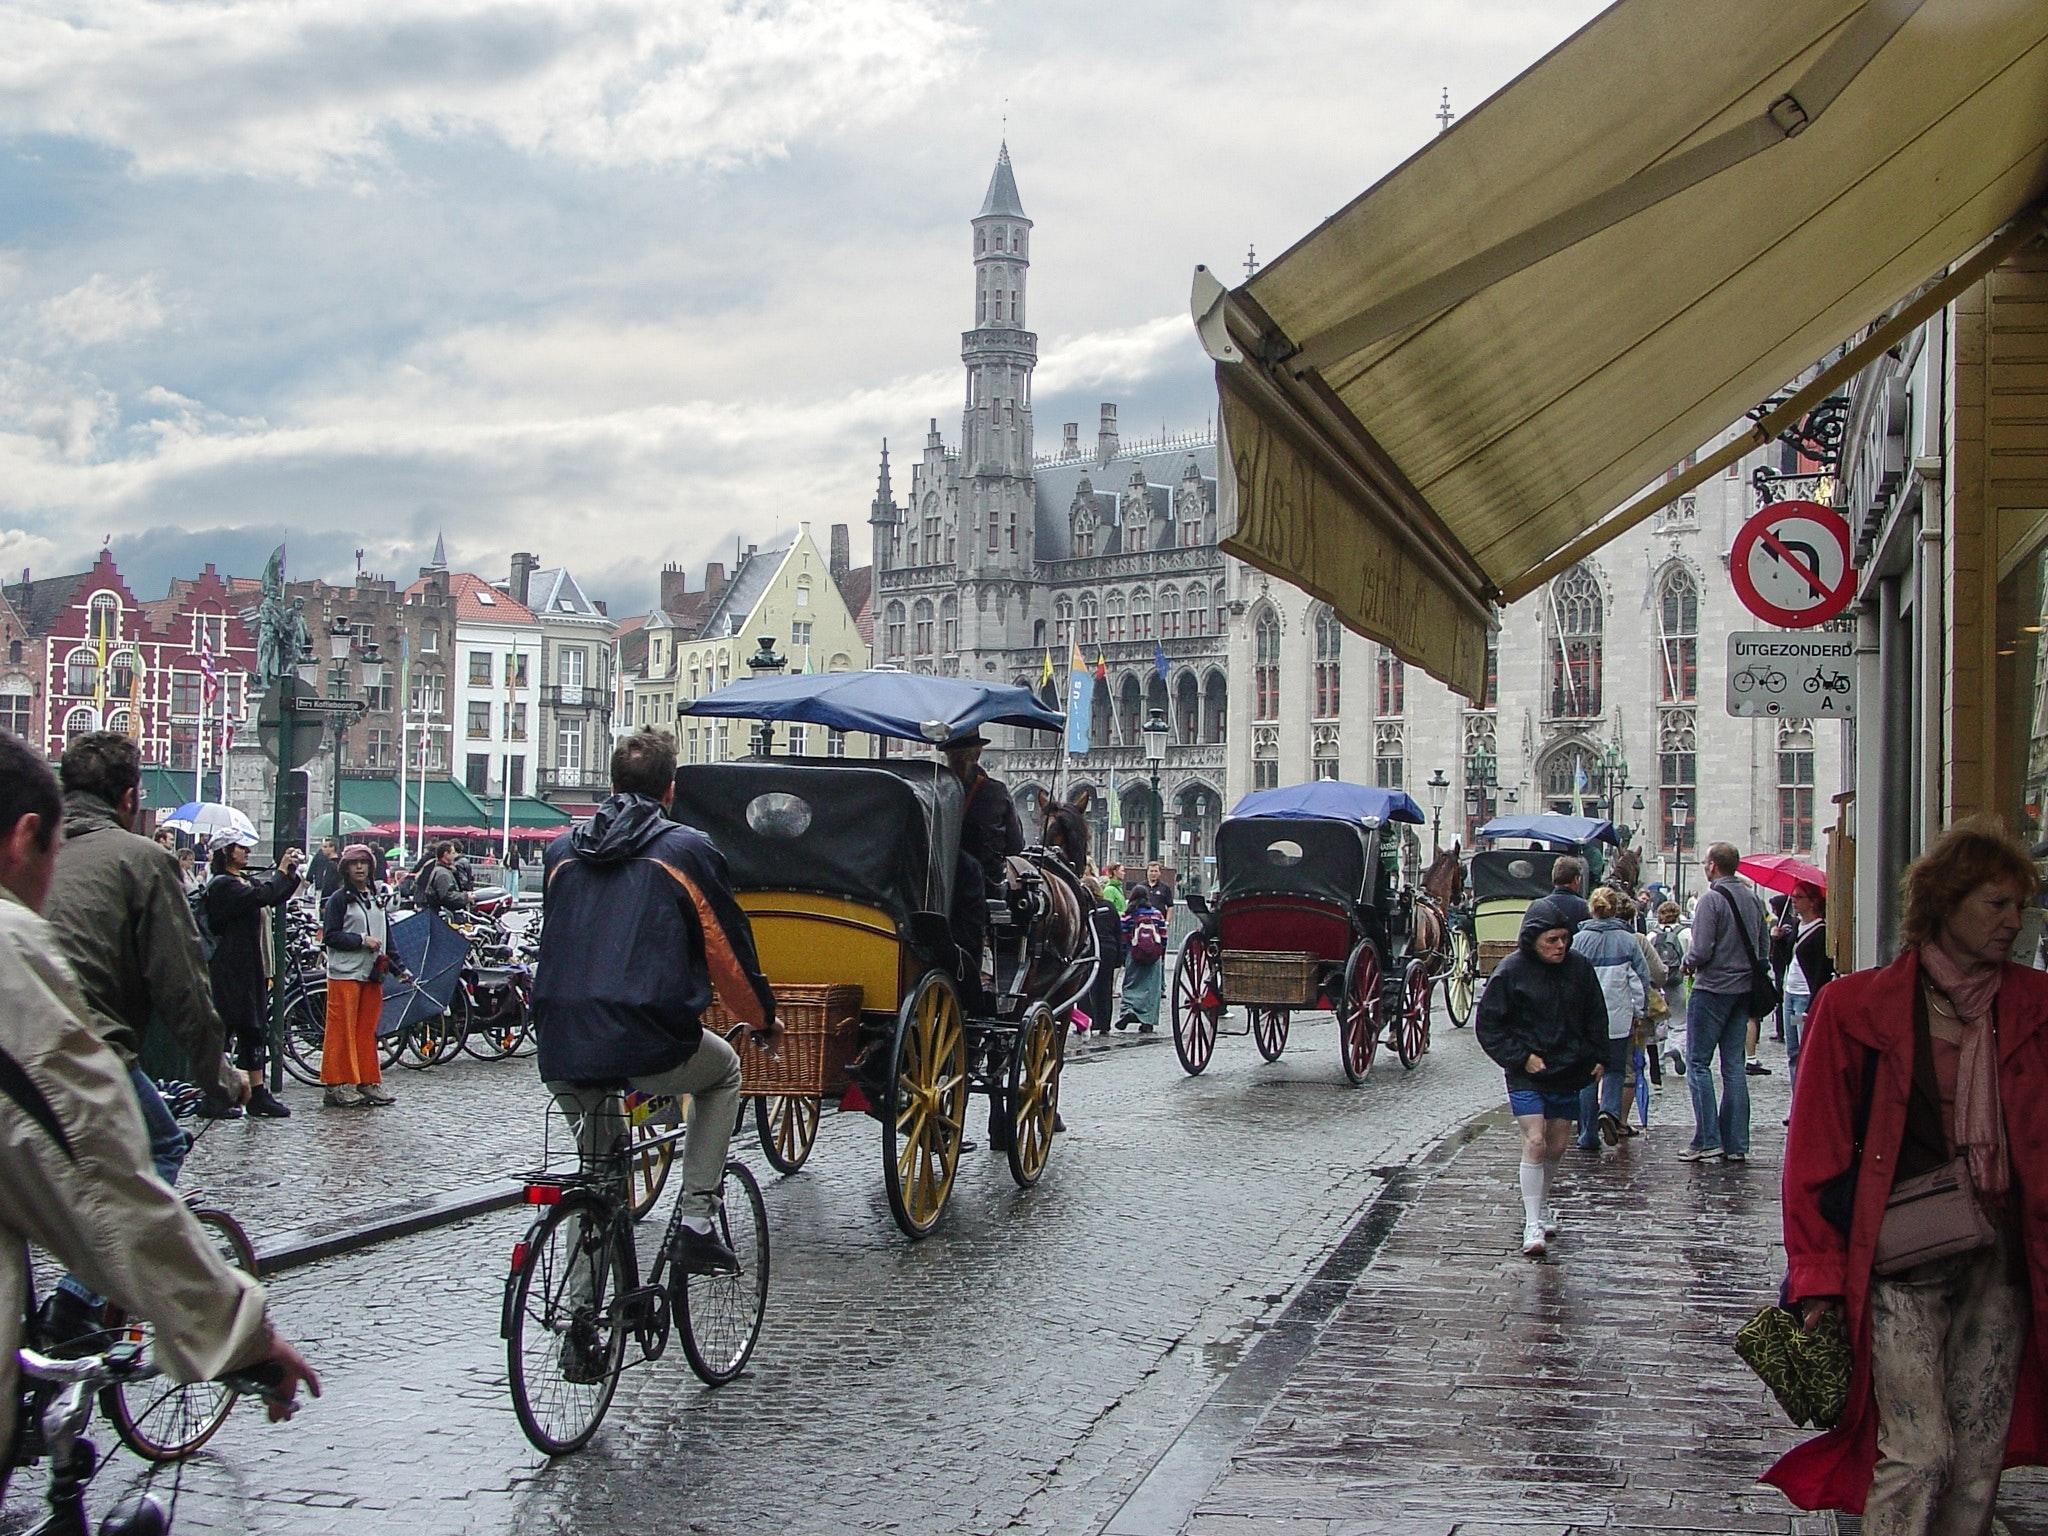 Foto De Stock Gratuita Sobre Belga Bélgica Benelux